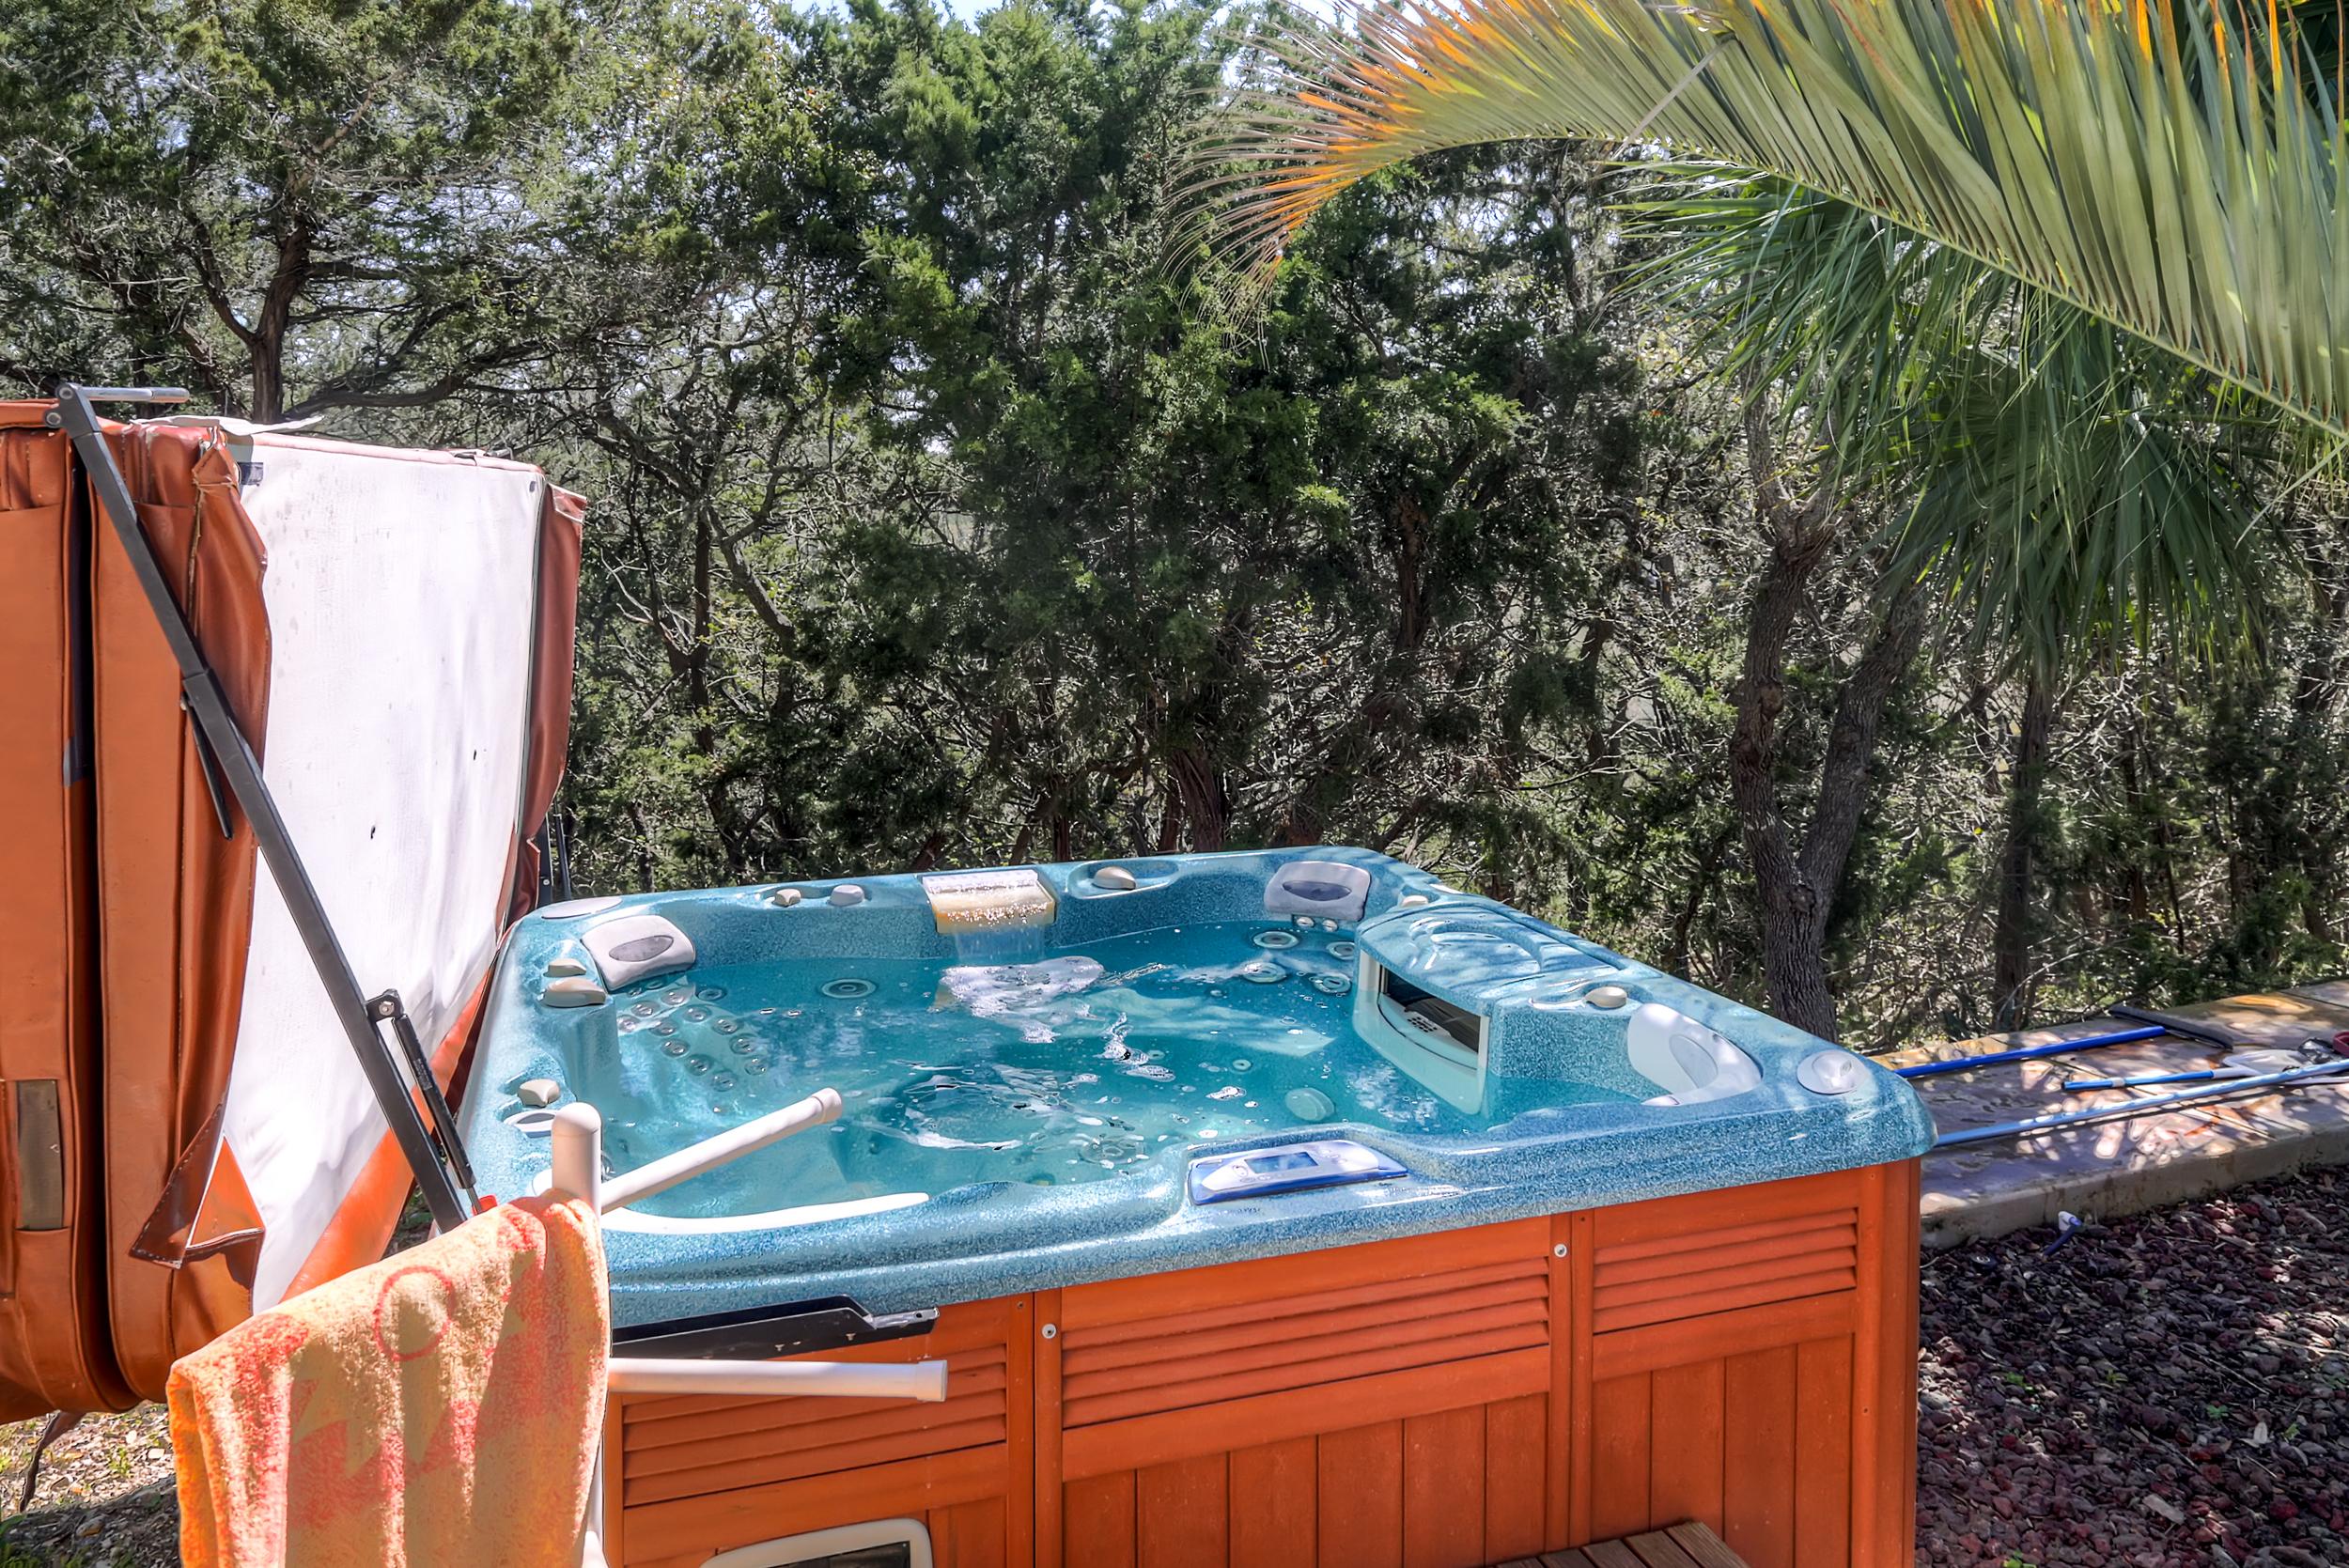 QuintilianiTamra - Hot Tub 3 - Copy.jpg